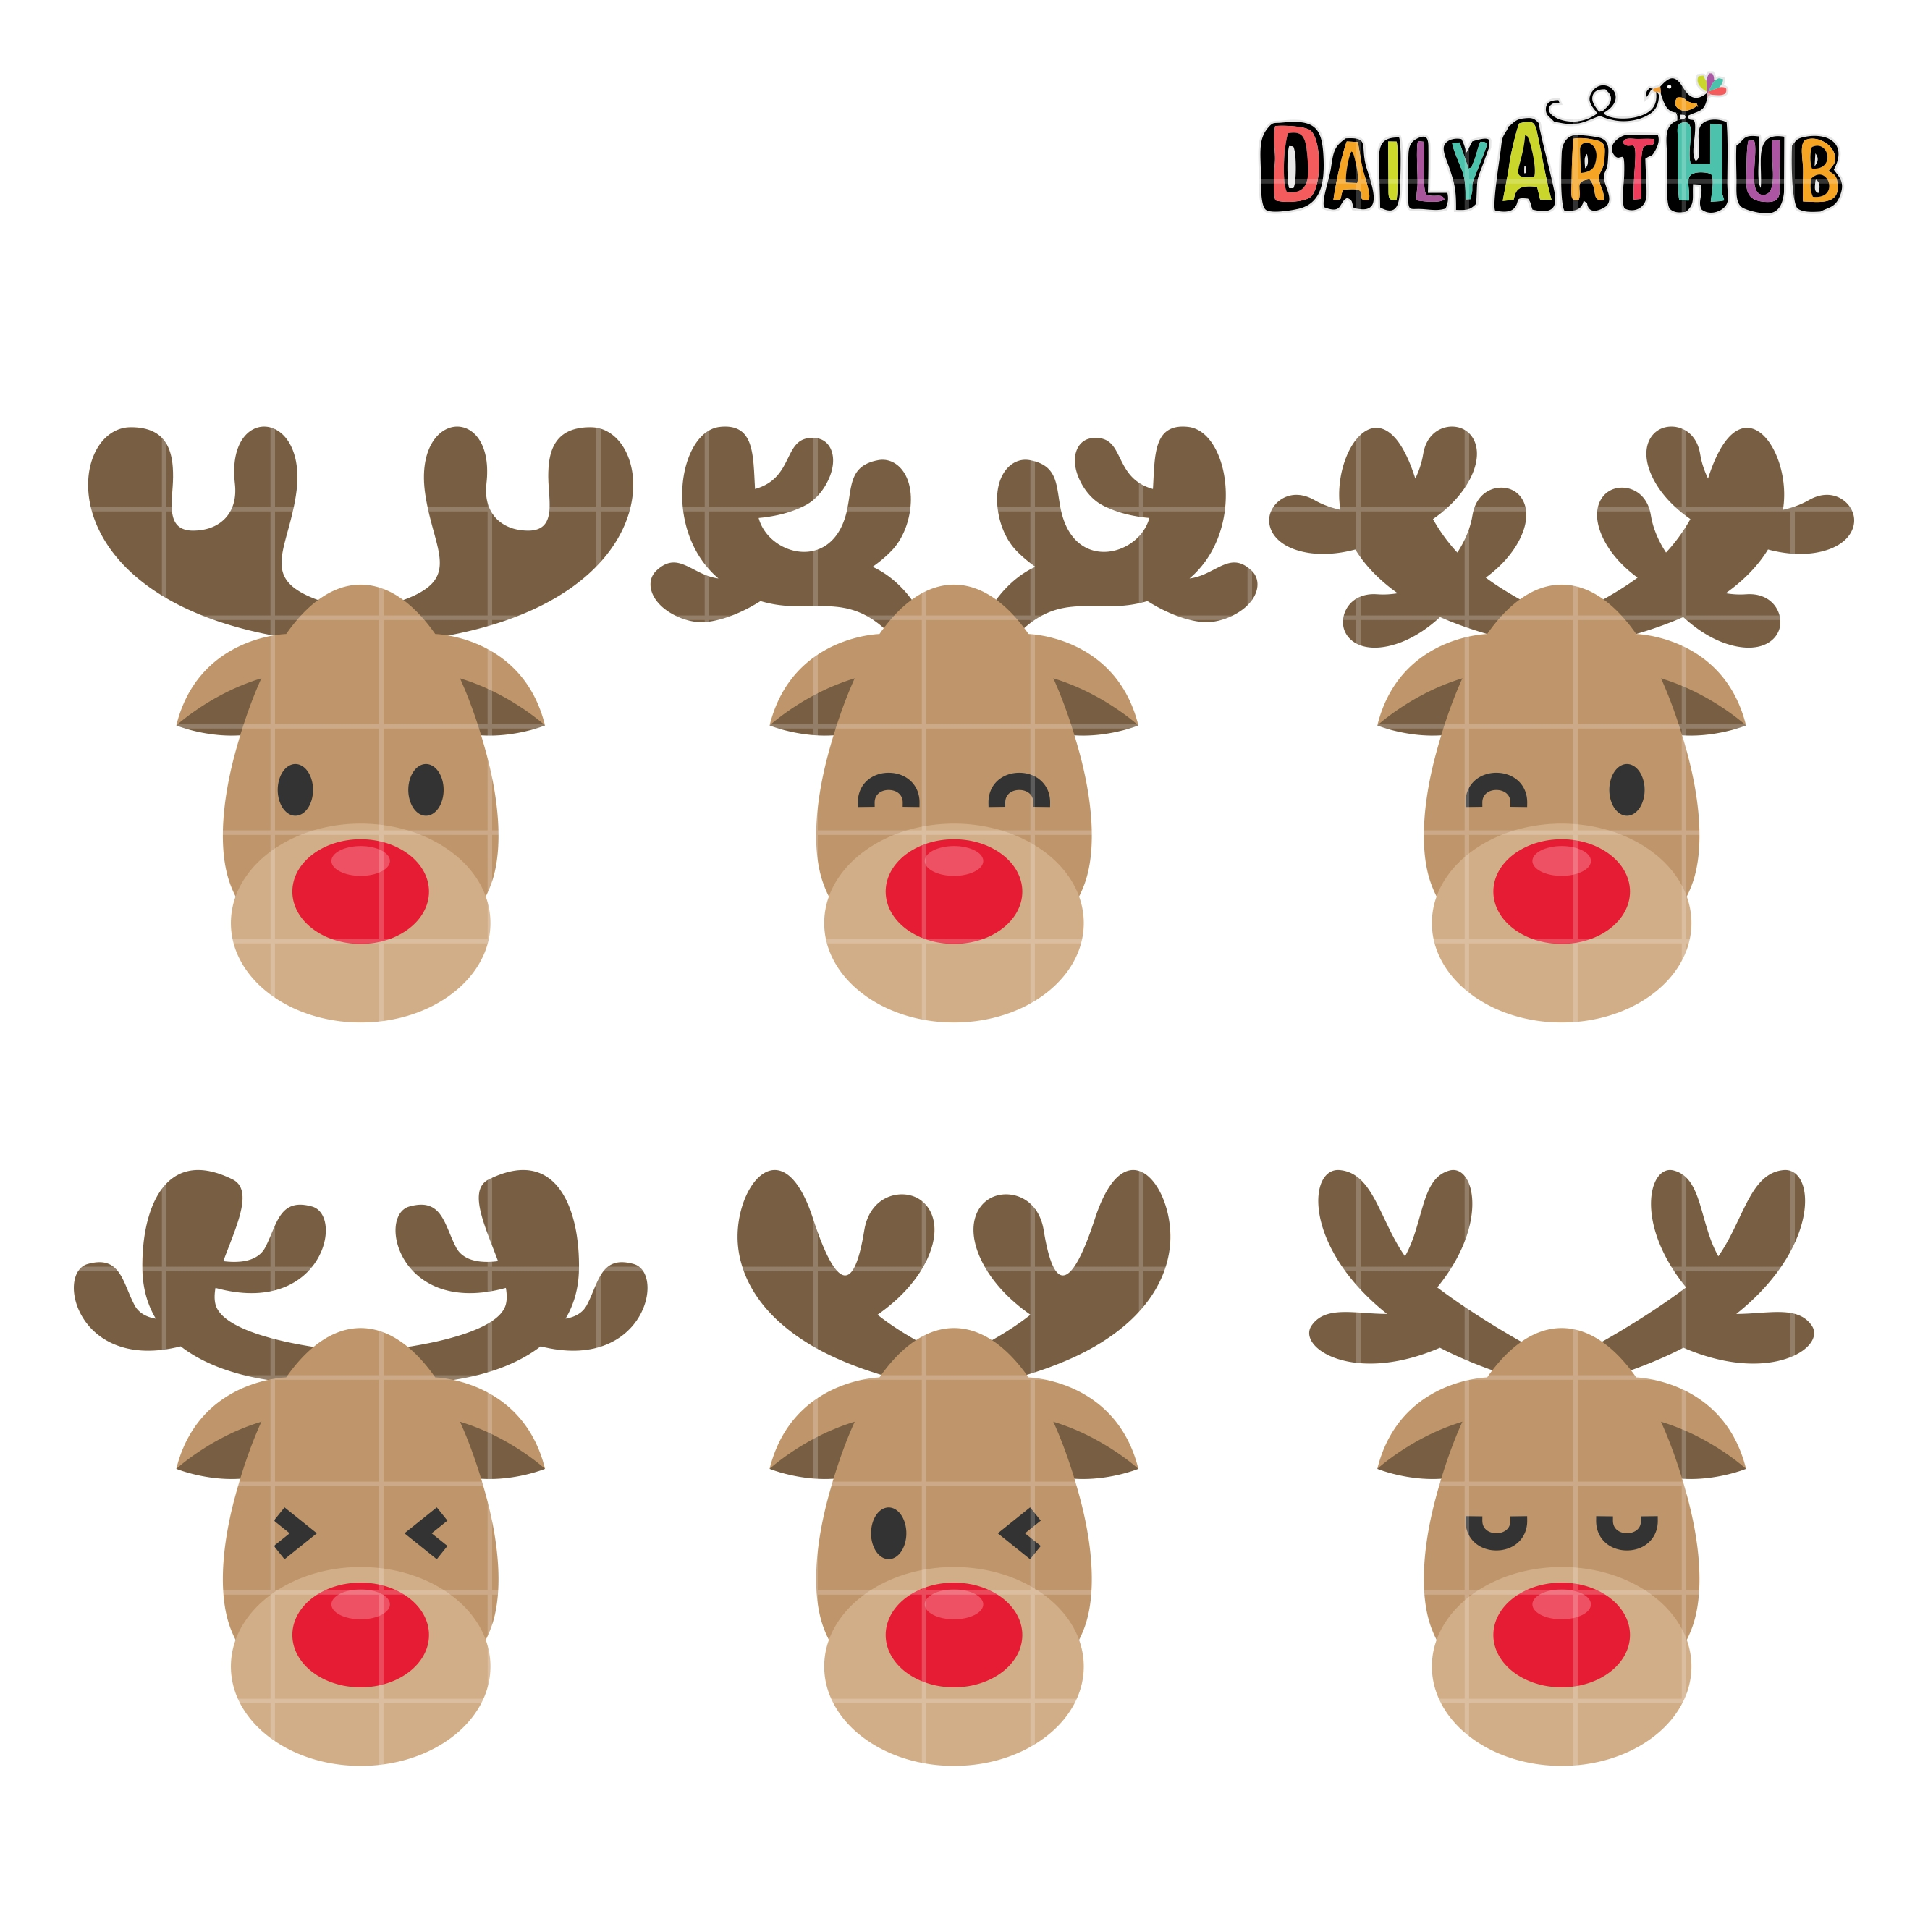 Clipart reindeer face. Station